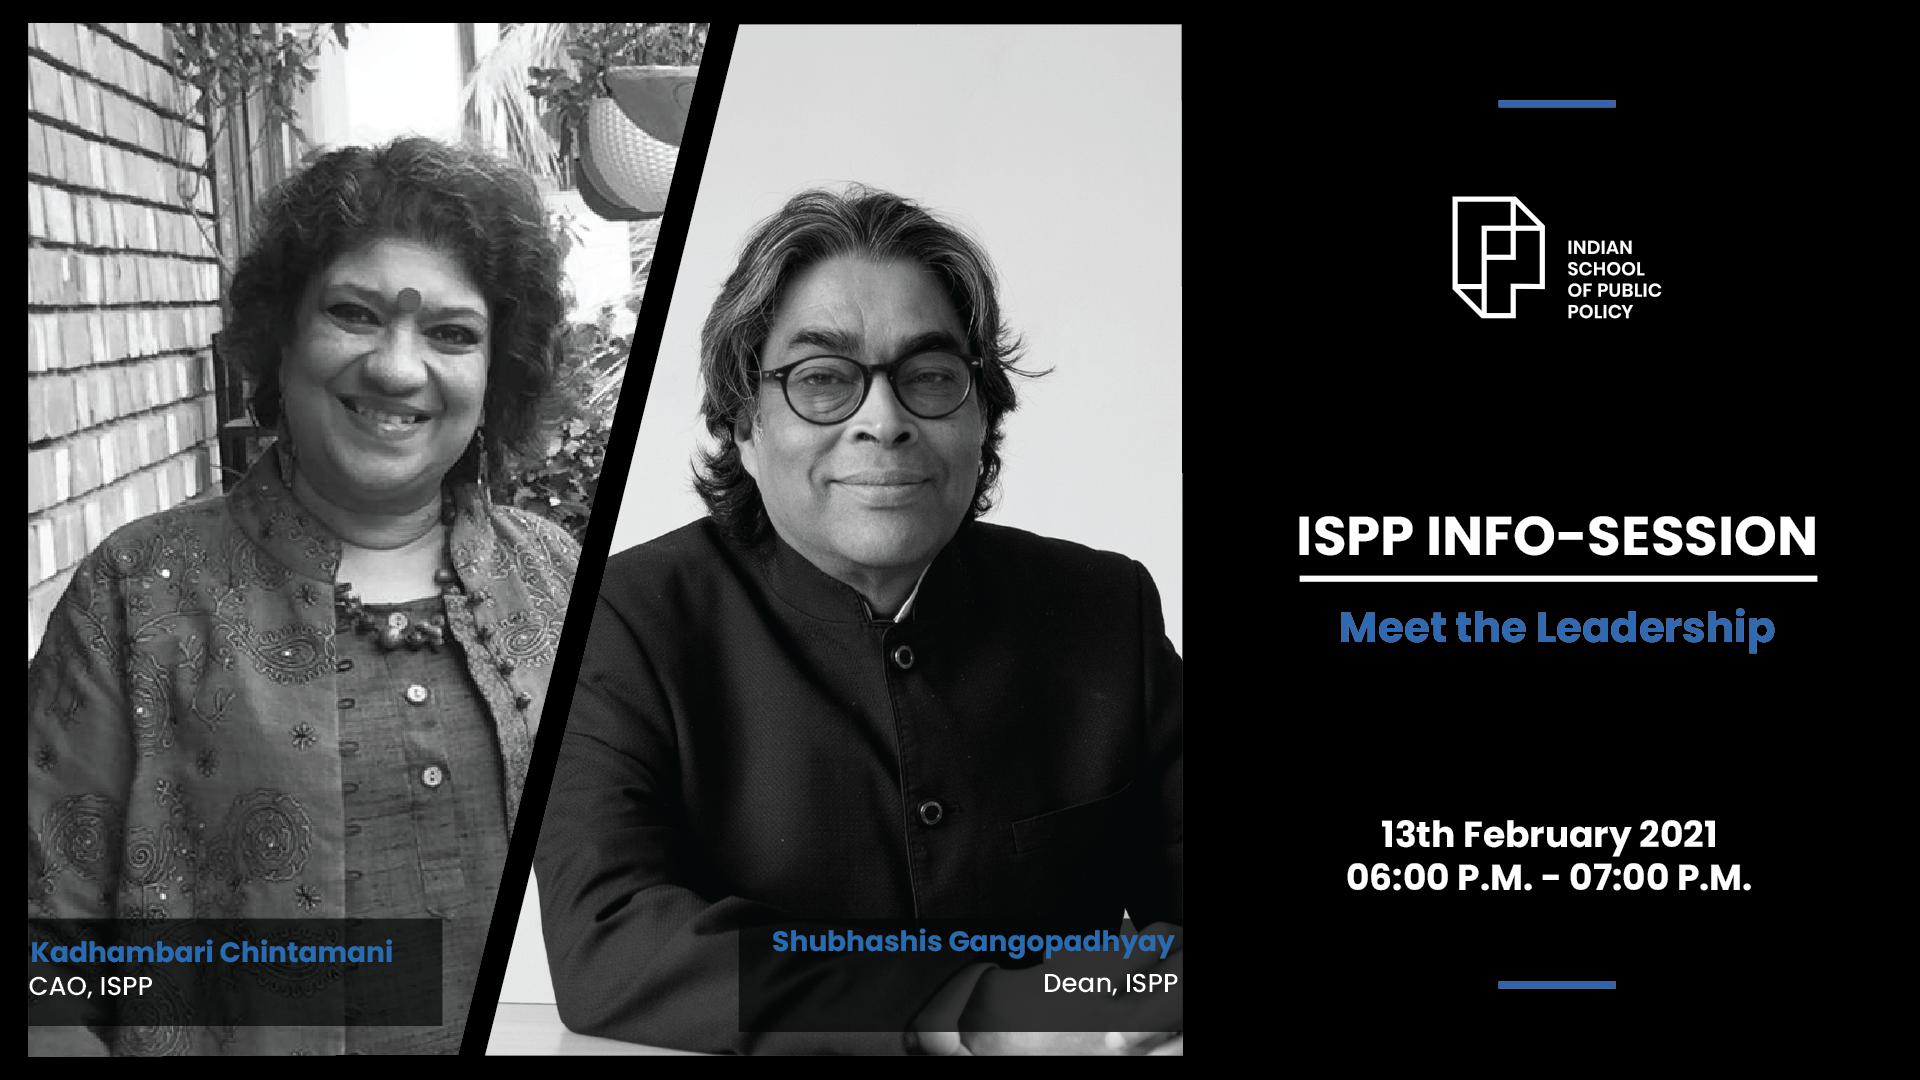 ISPP Info Session: Meet the Leadership